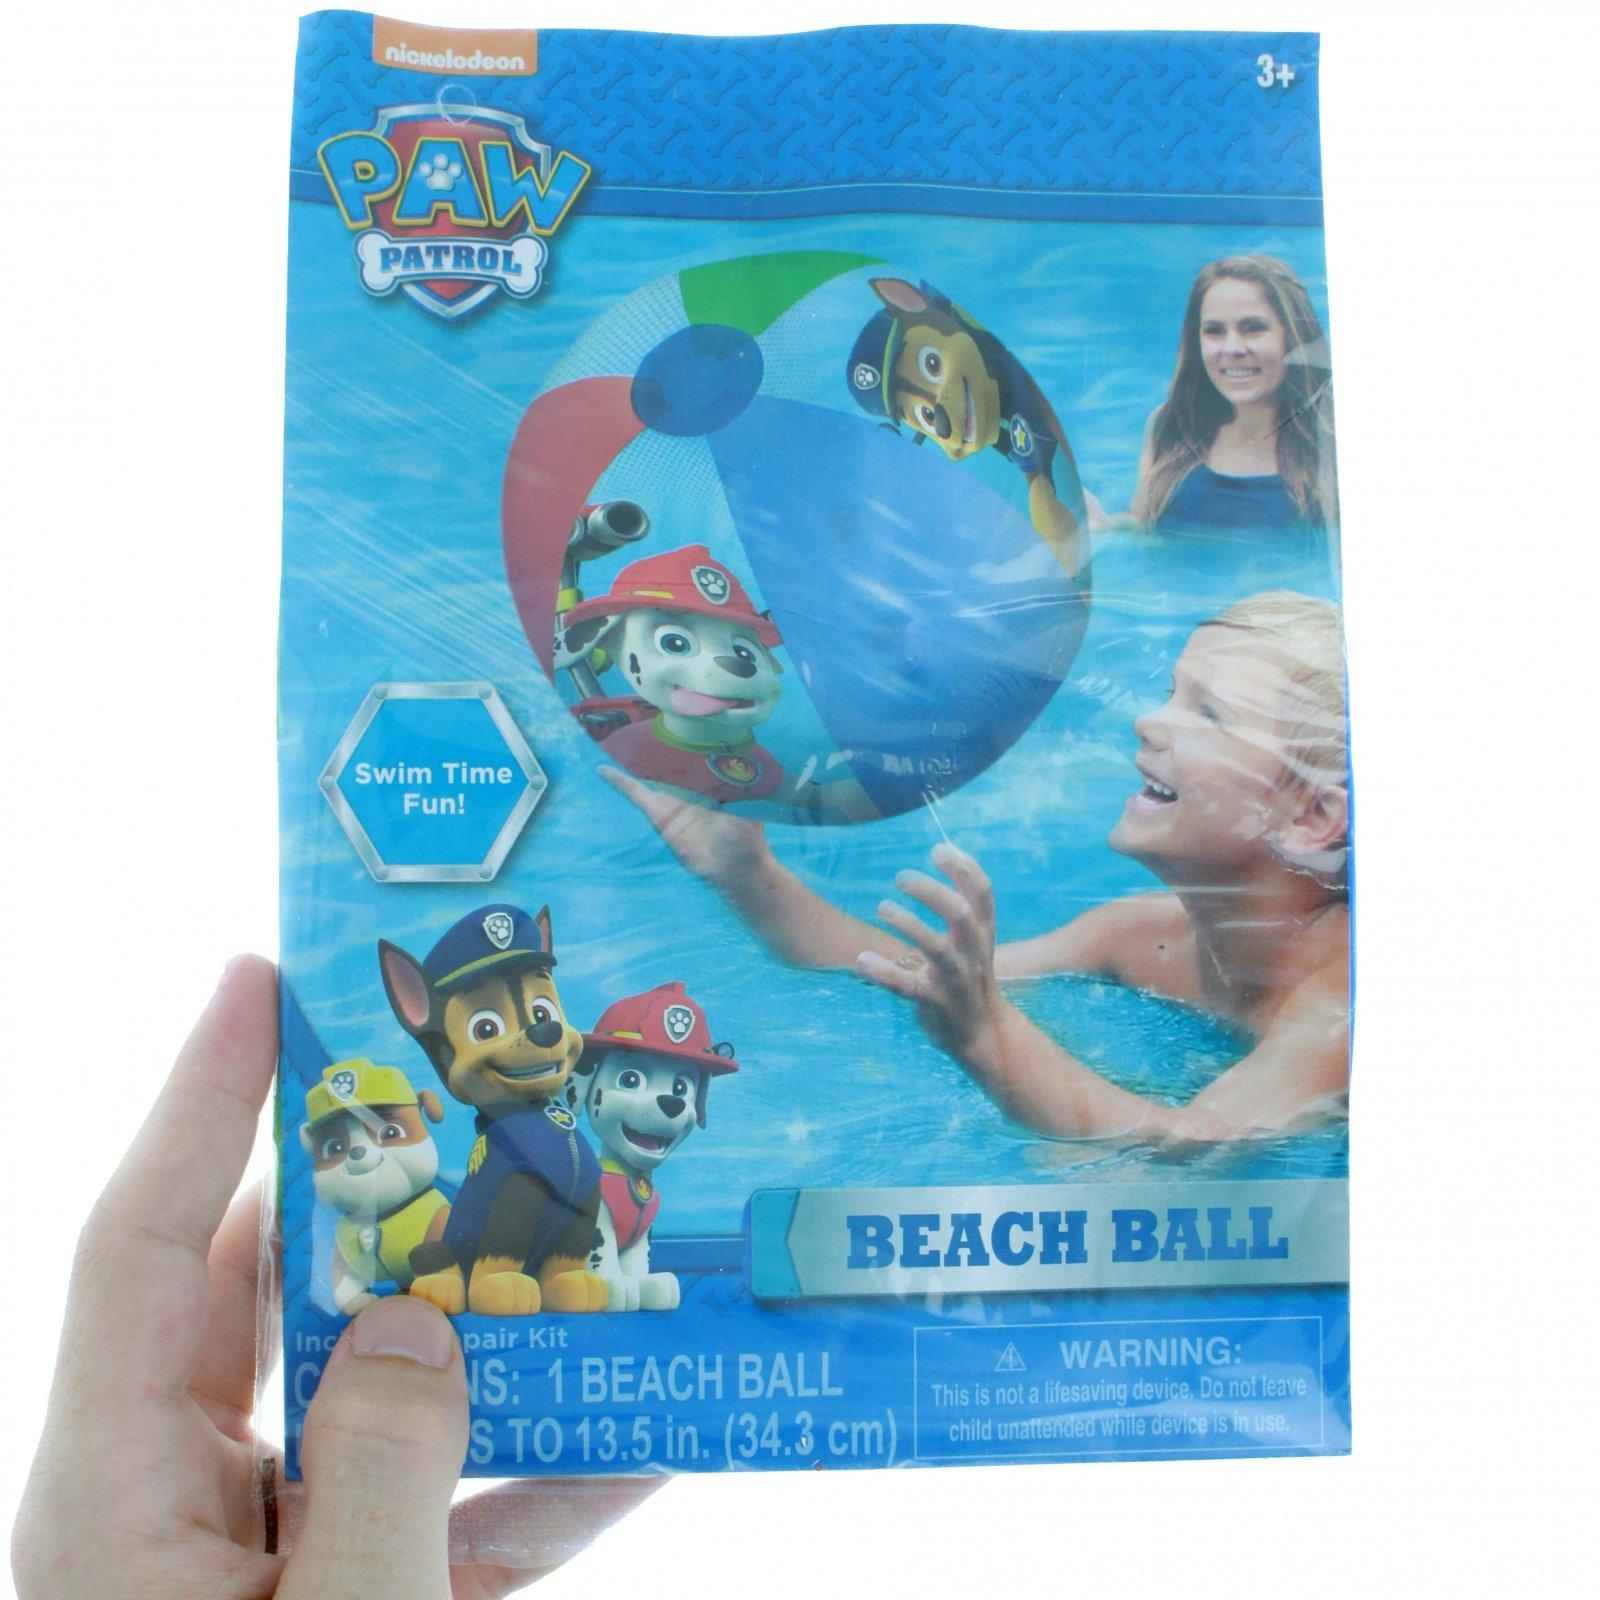 "Paw Patrol Inflatable 13.5"" Beach Ball"